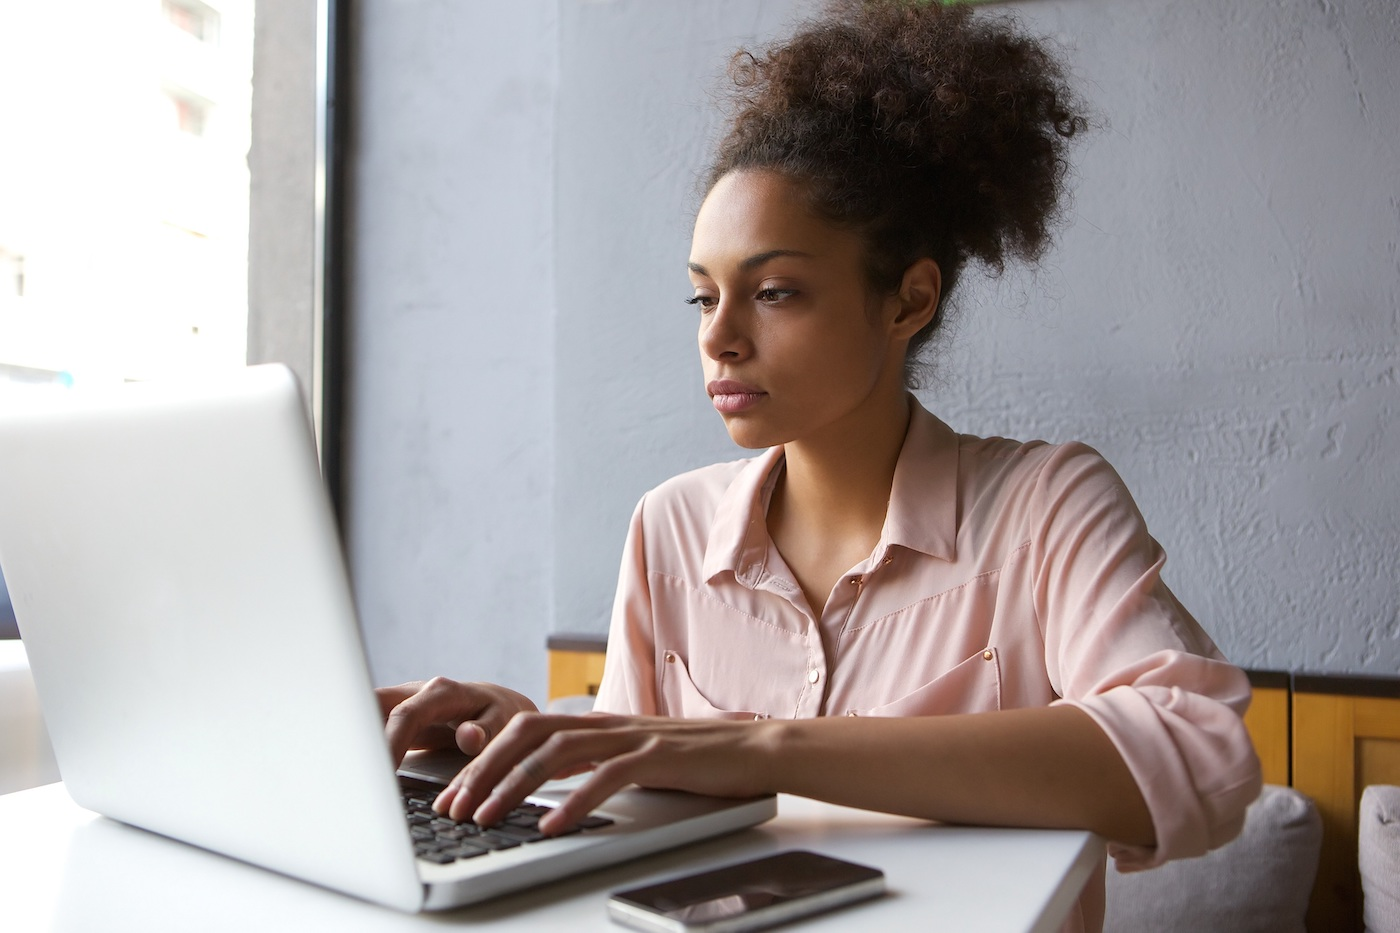 Young woman using auto-finance calculator